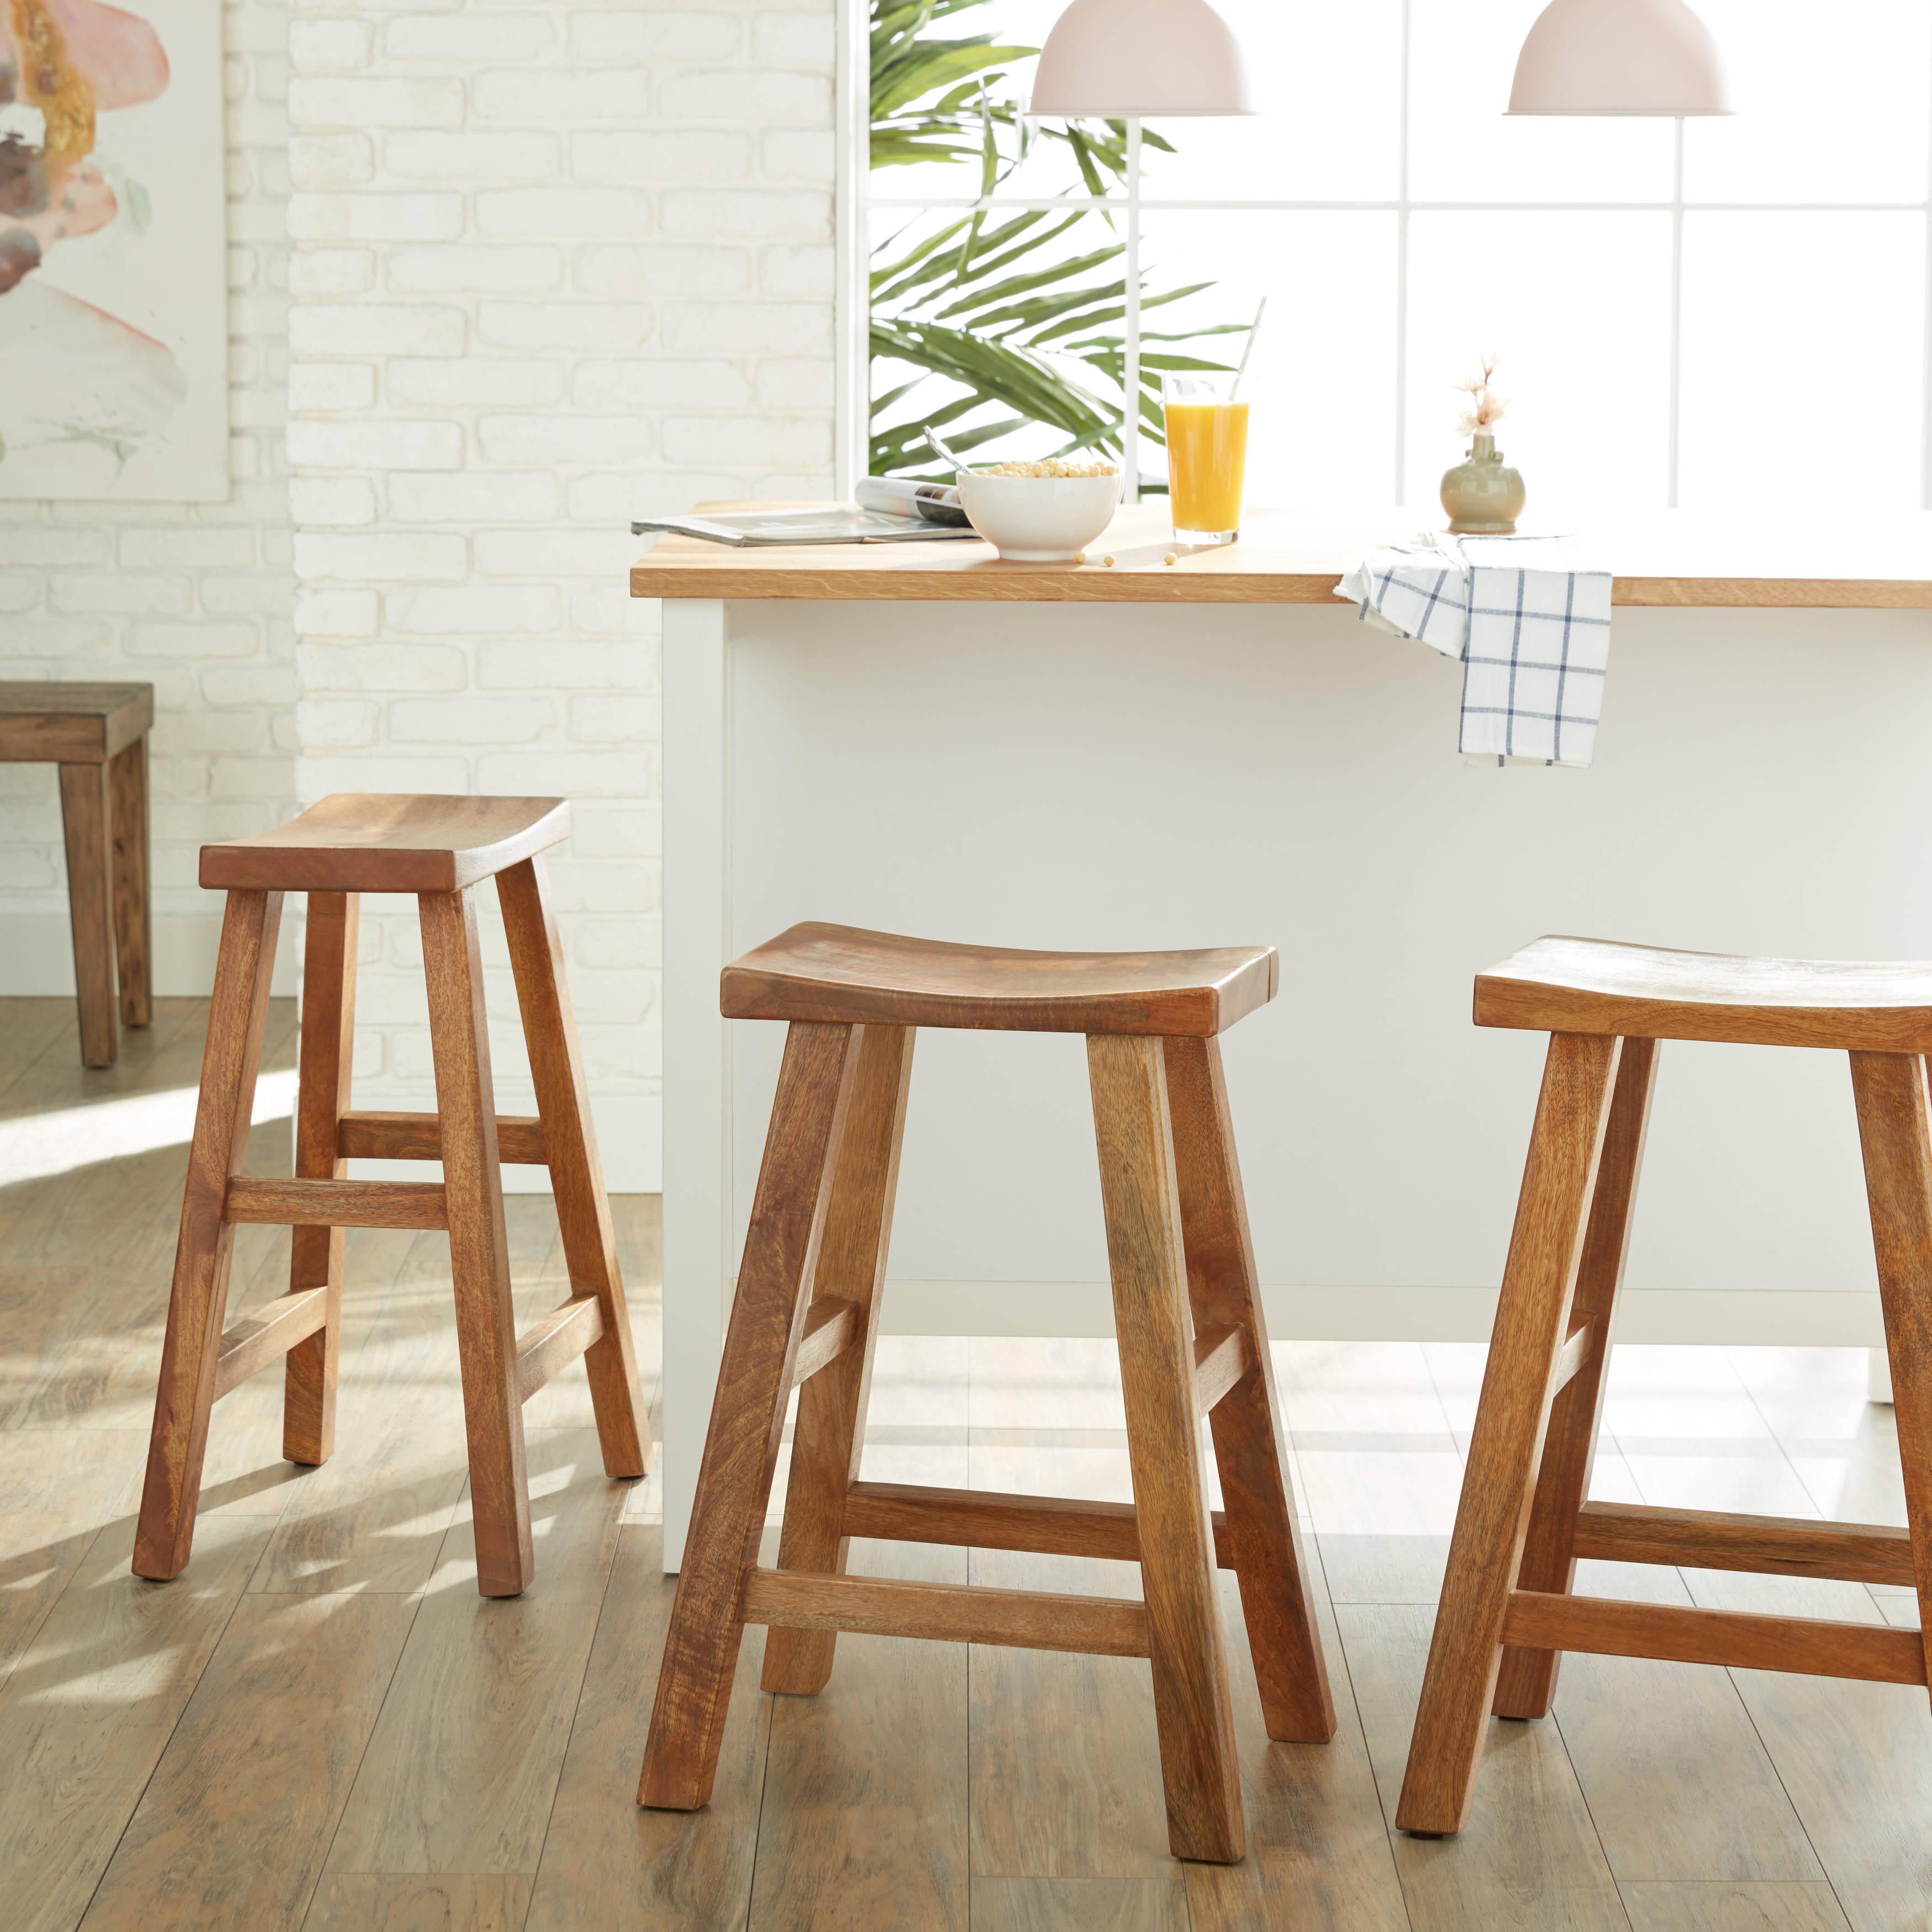 Shop CG Sparks Handmade Mango Saddle Counter